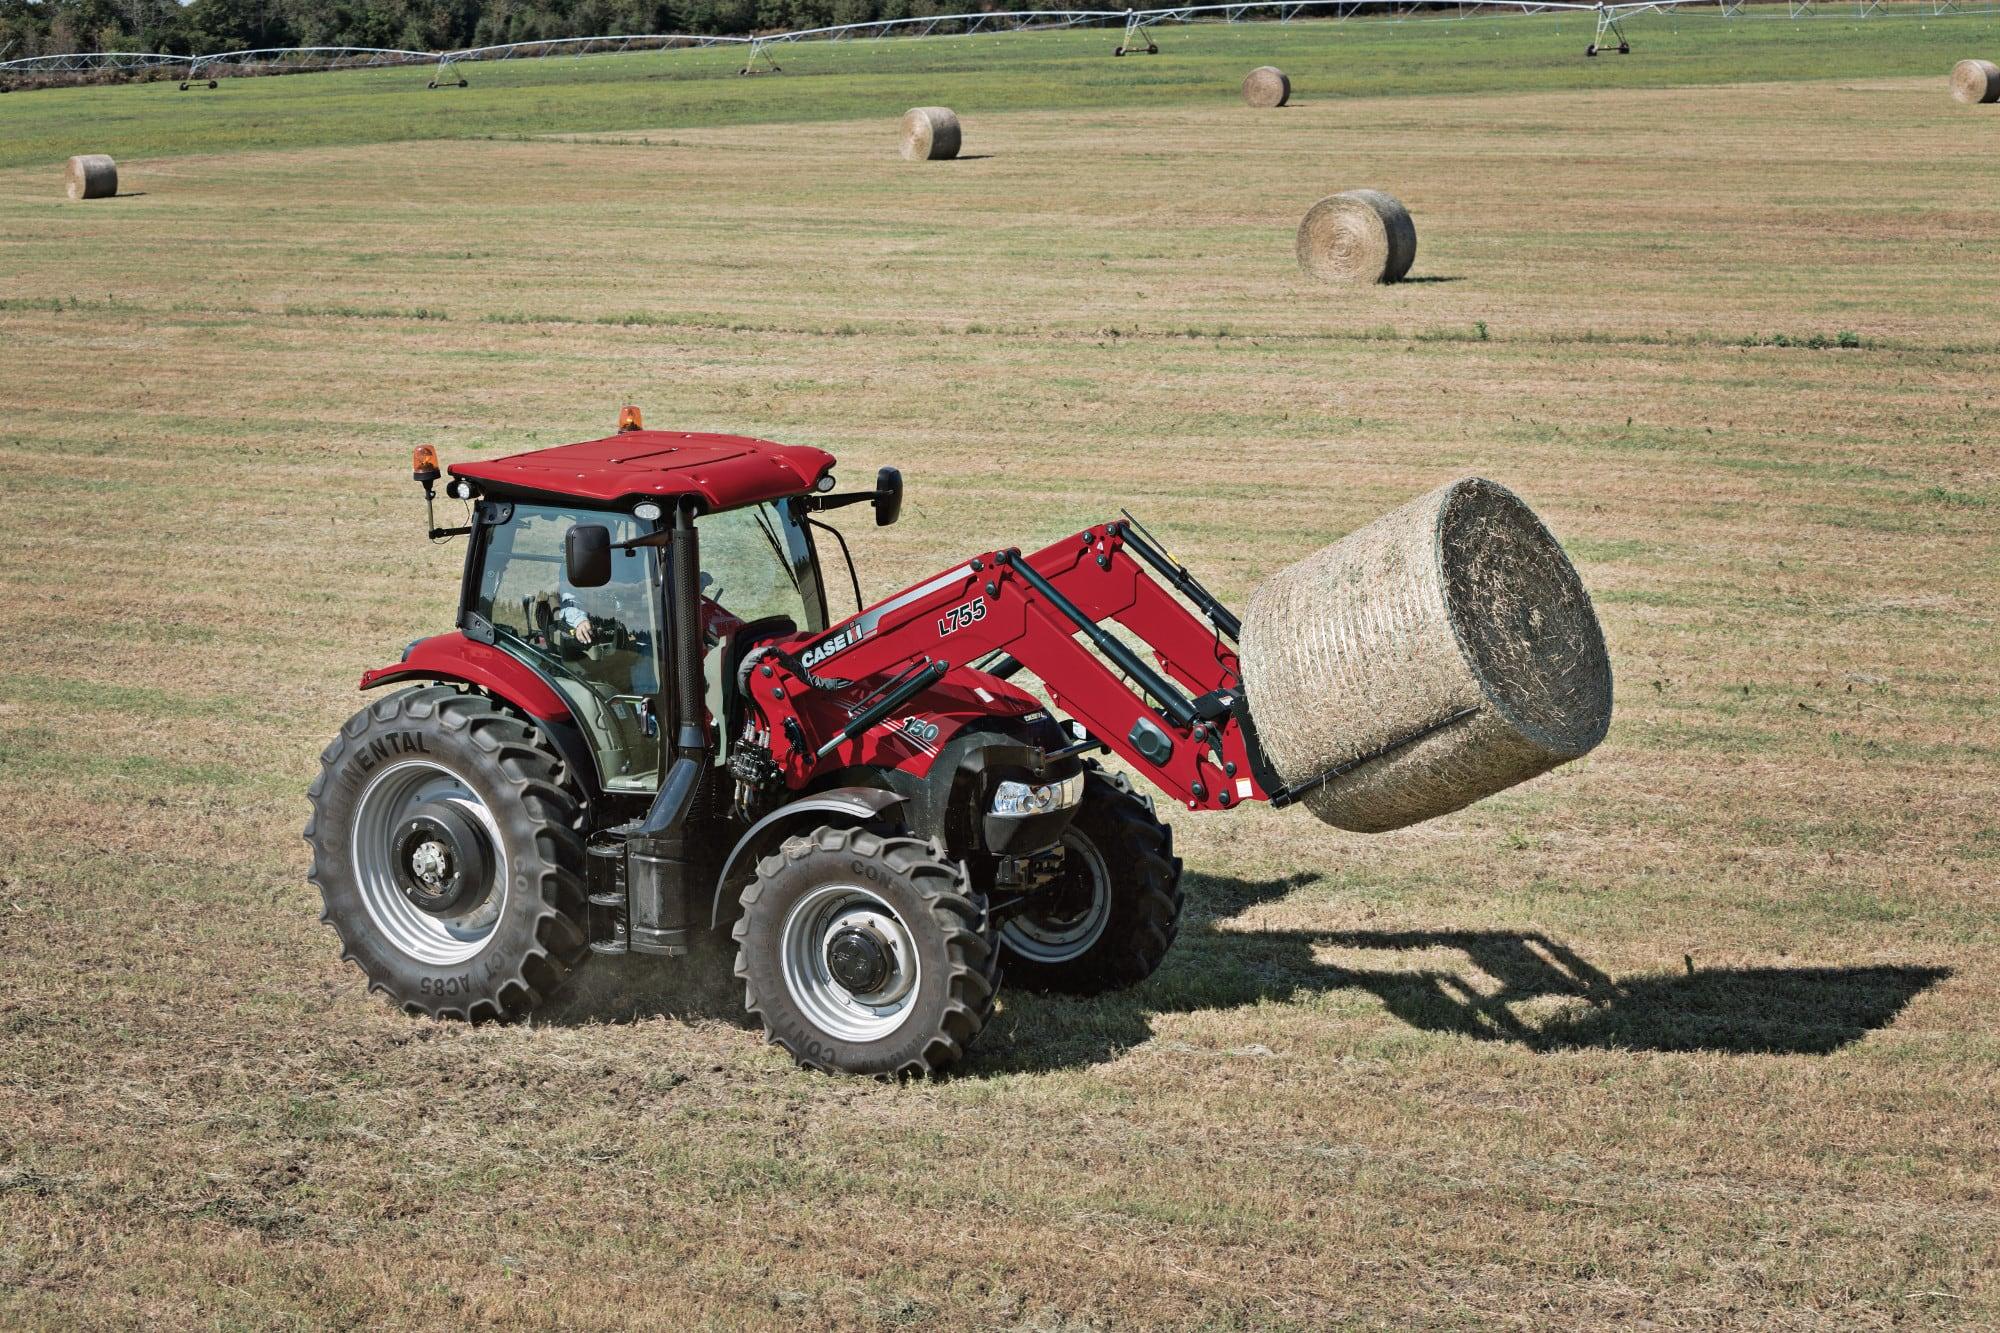 loader_l755_maxxum_150_tractor_l755_loader_1944?width=360&height=252 l705 series loaders farm loaders case ih